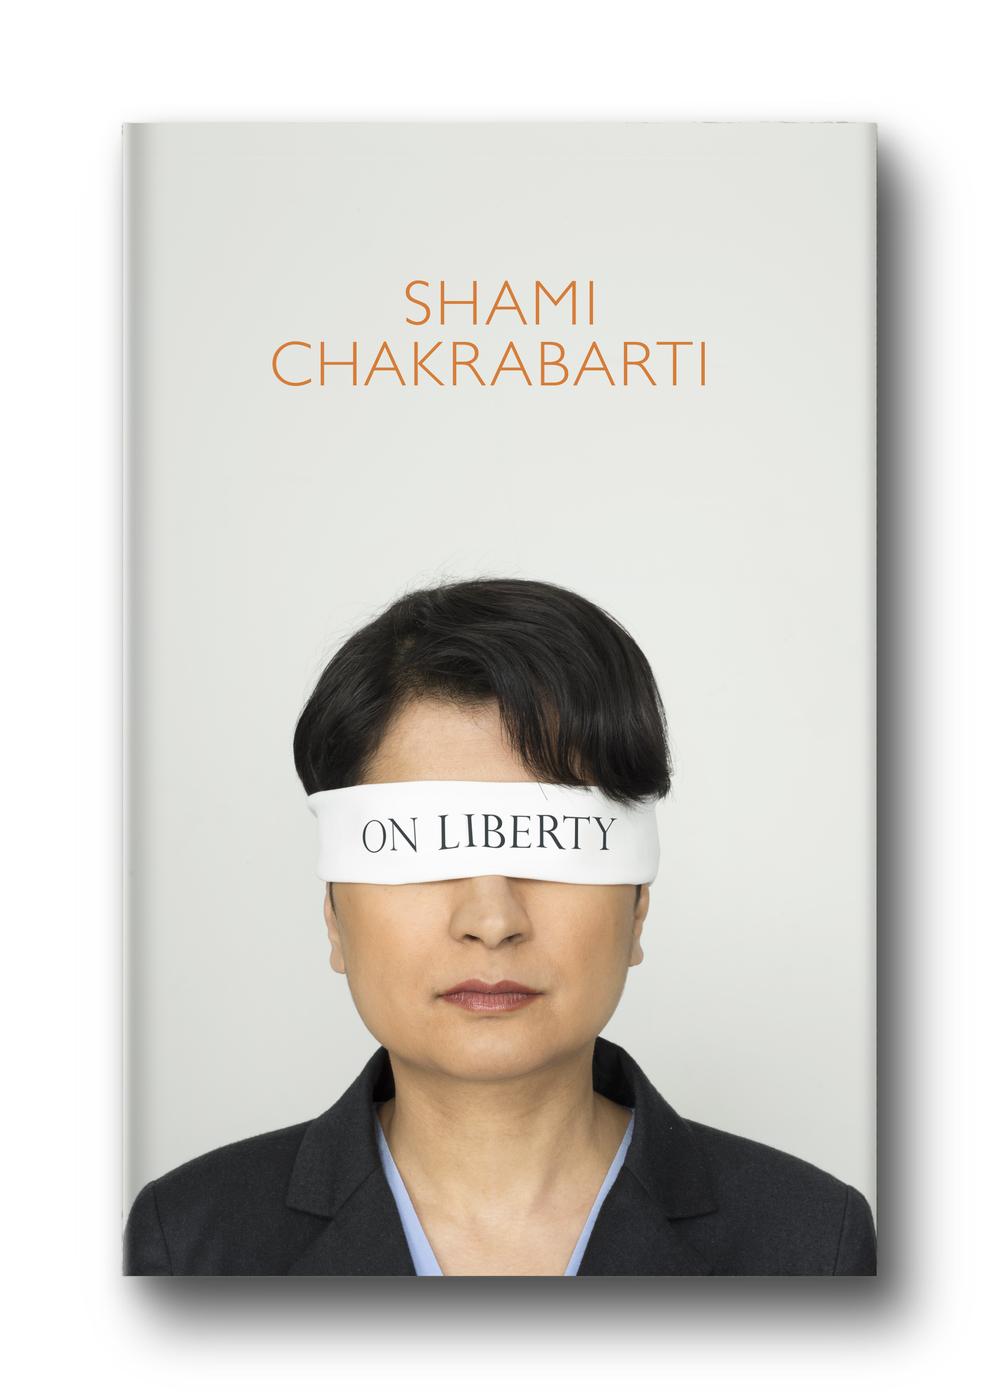 On Liberty by Shami Chakrabarti - Art Direction/Design: Jim Stoddart Photography: Paul Stuart